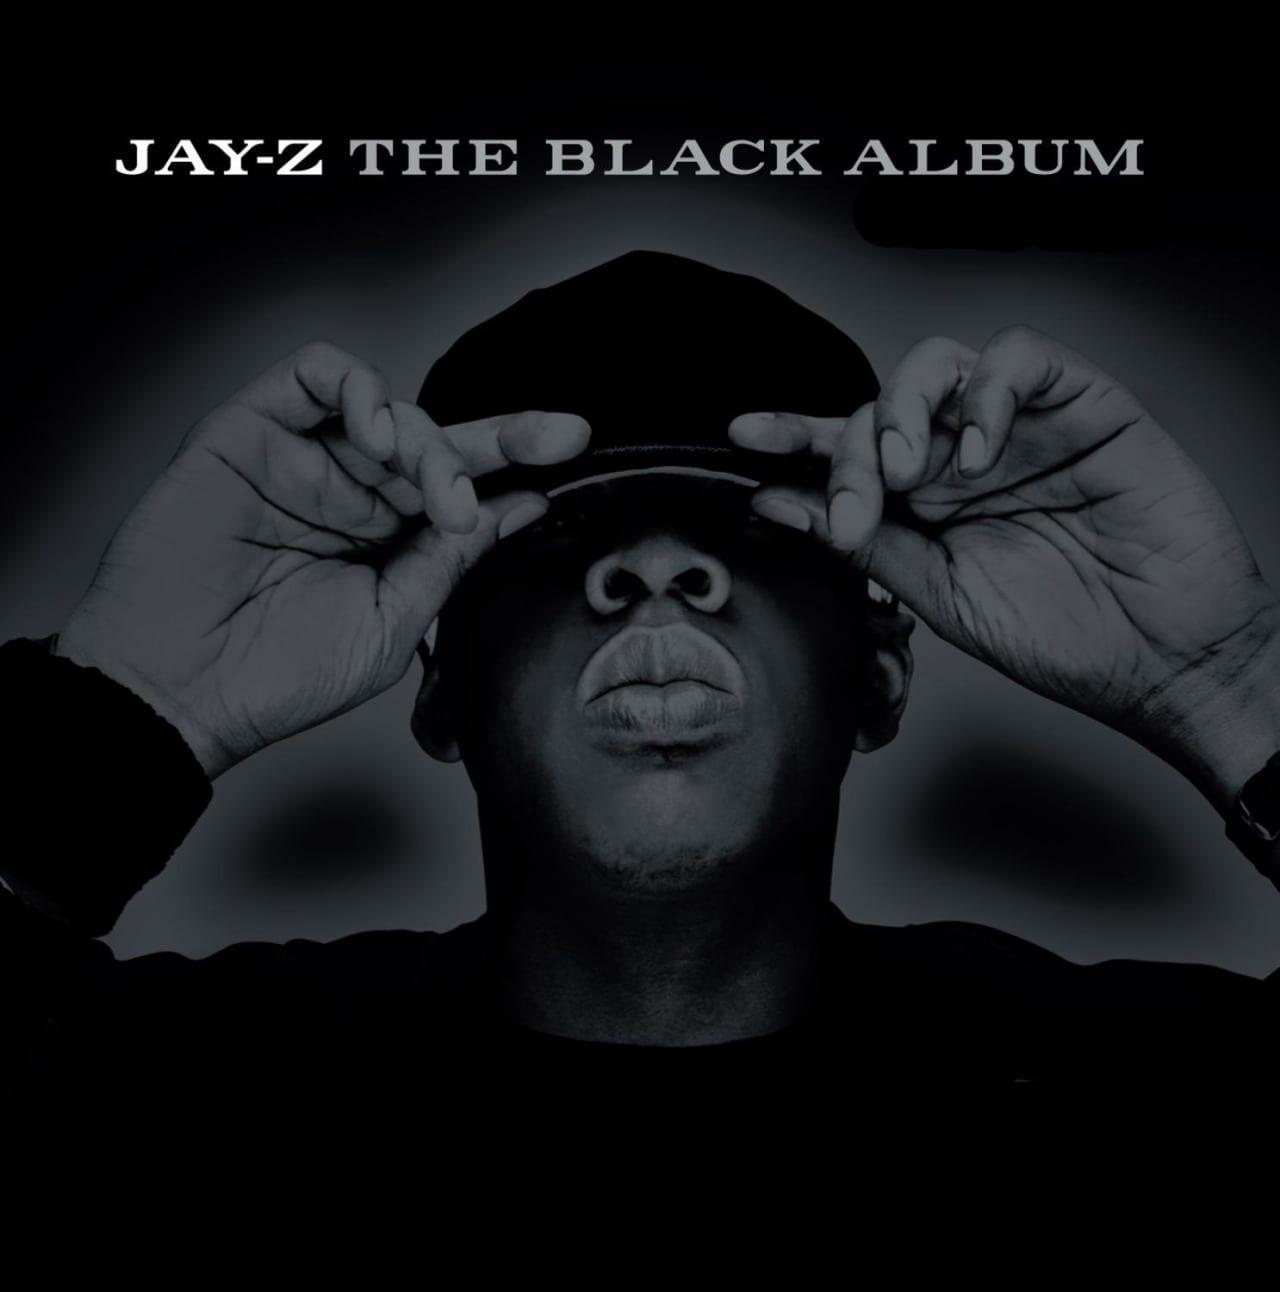 TodayinHip HopHistory:JAY ZDropped'TheBlackAlbum'YearsAgo